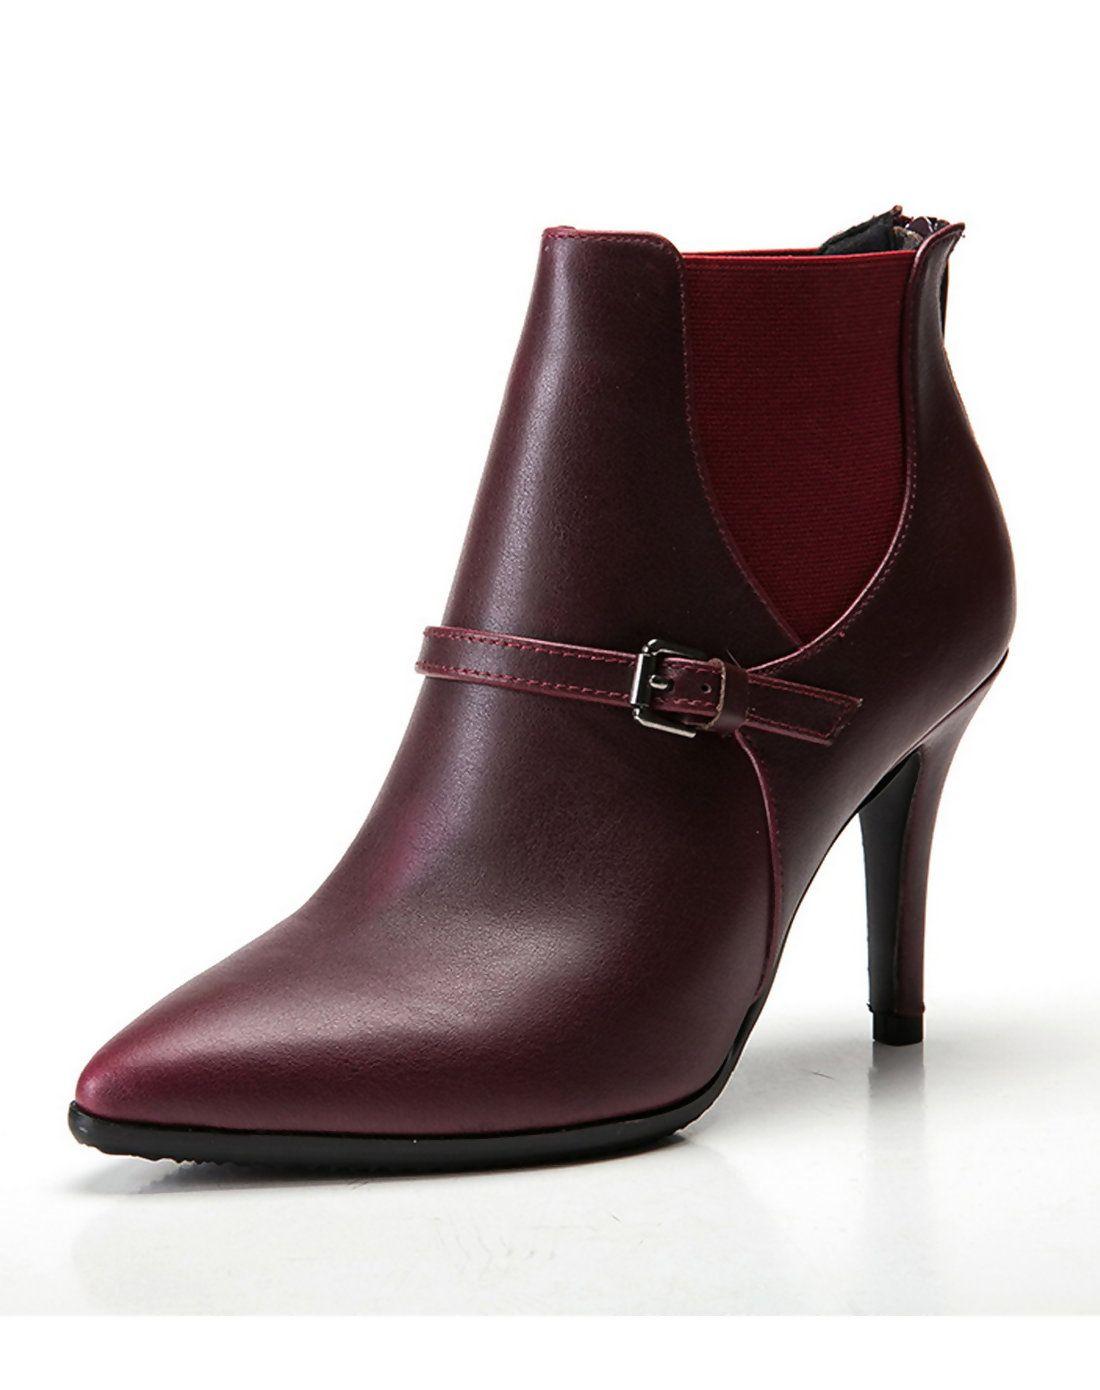 AdoreWe VIPme Boots VICONE Wine Red Belt Buckle Elastica High